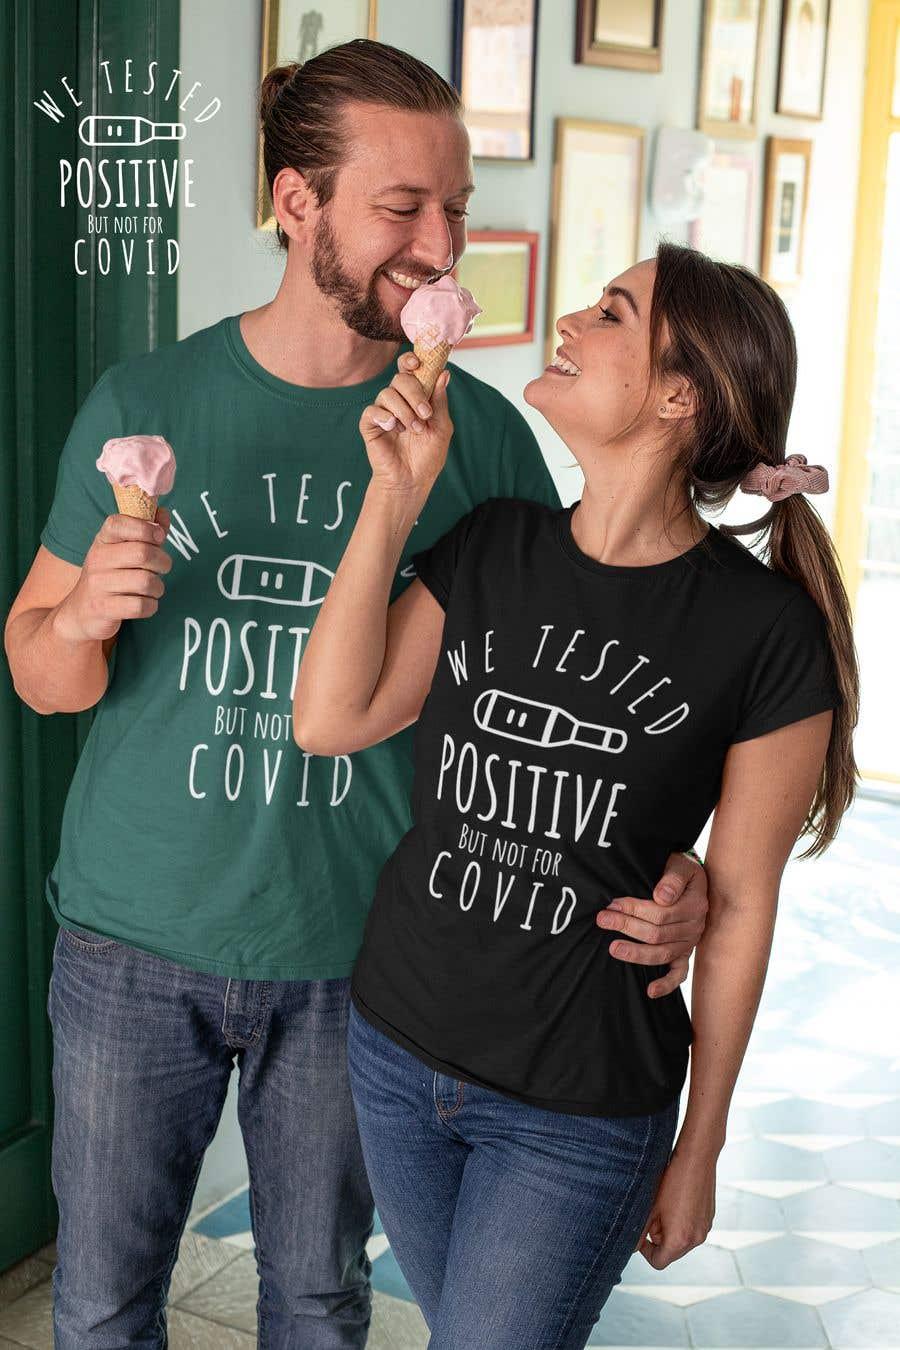 Konkurrenceindlæg #                                        20                                      for                                         Custom Typography Graphic Design - We Tested Positive